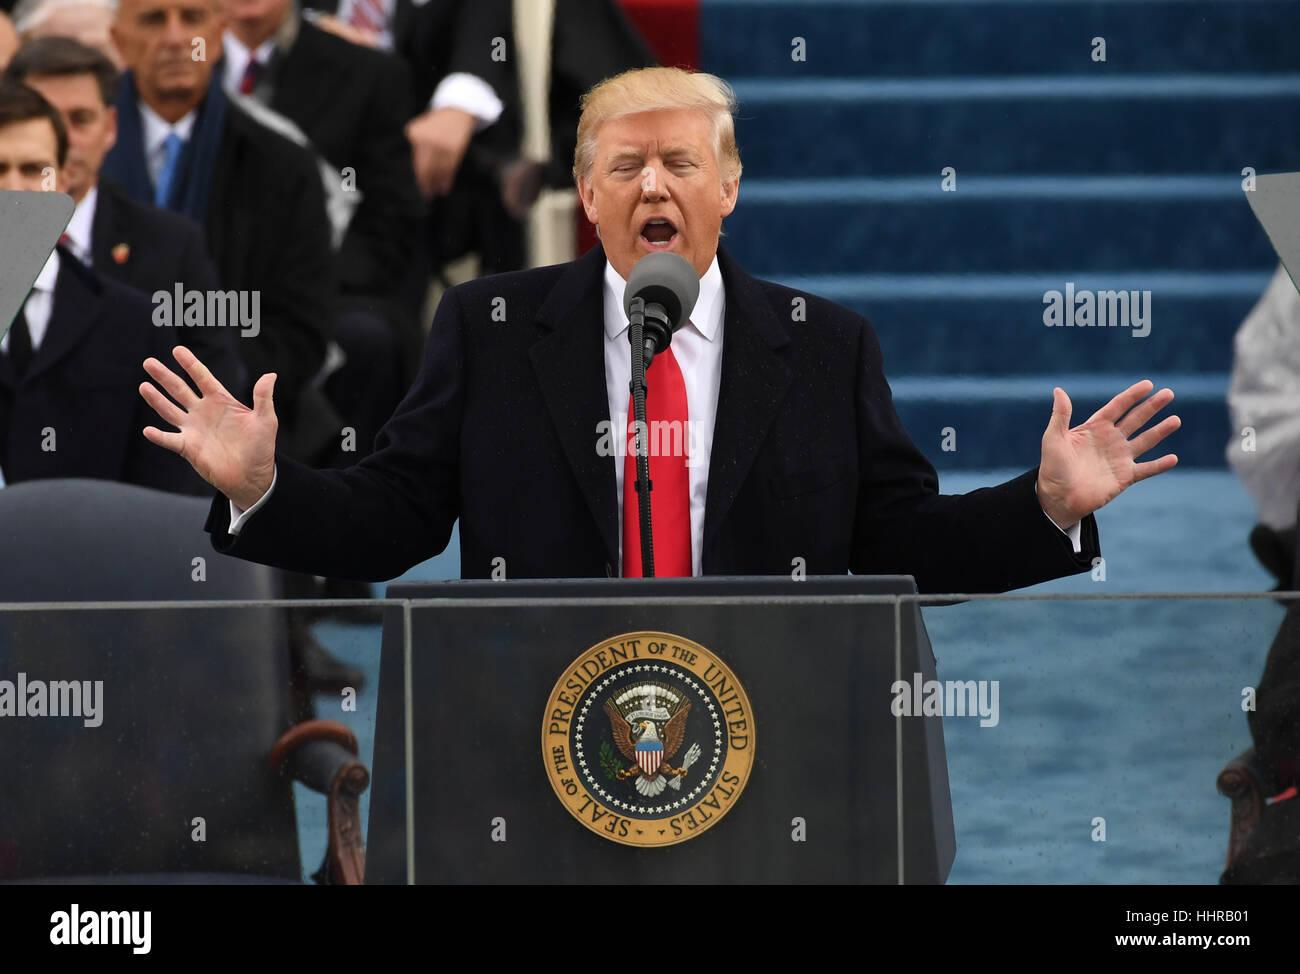 Washington, USA. 20. Januar 2017. Washington, USA. 20. Januar 2017. Präsident Donald Trump liefert seine Antrittsrede Stockbild